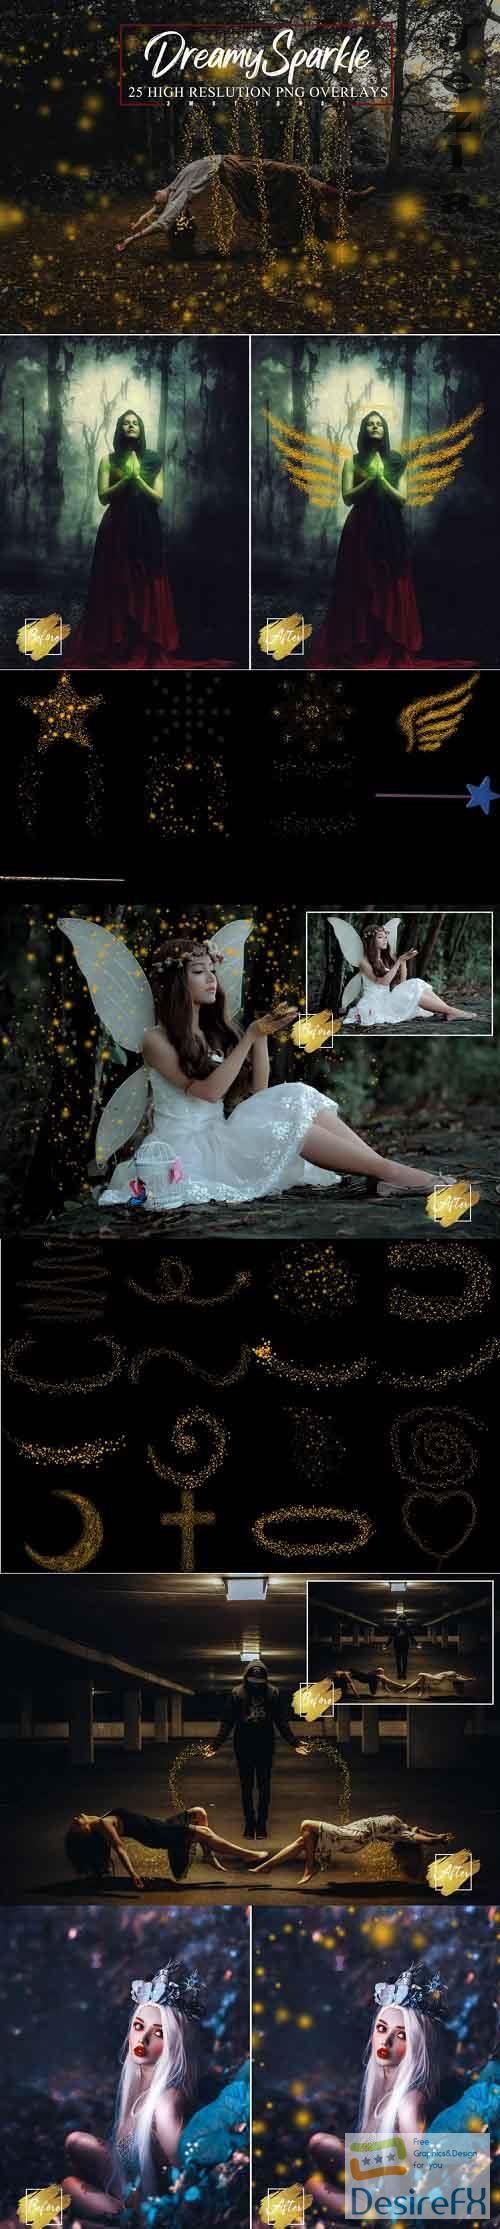 25 Dreamy Sparkle Overlays, Magical Golden Stardust - 1145207